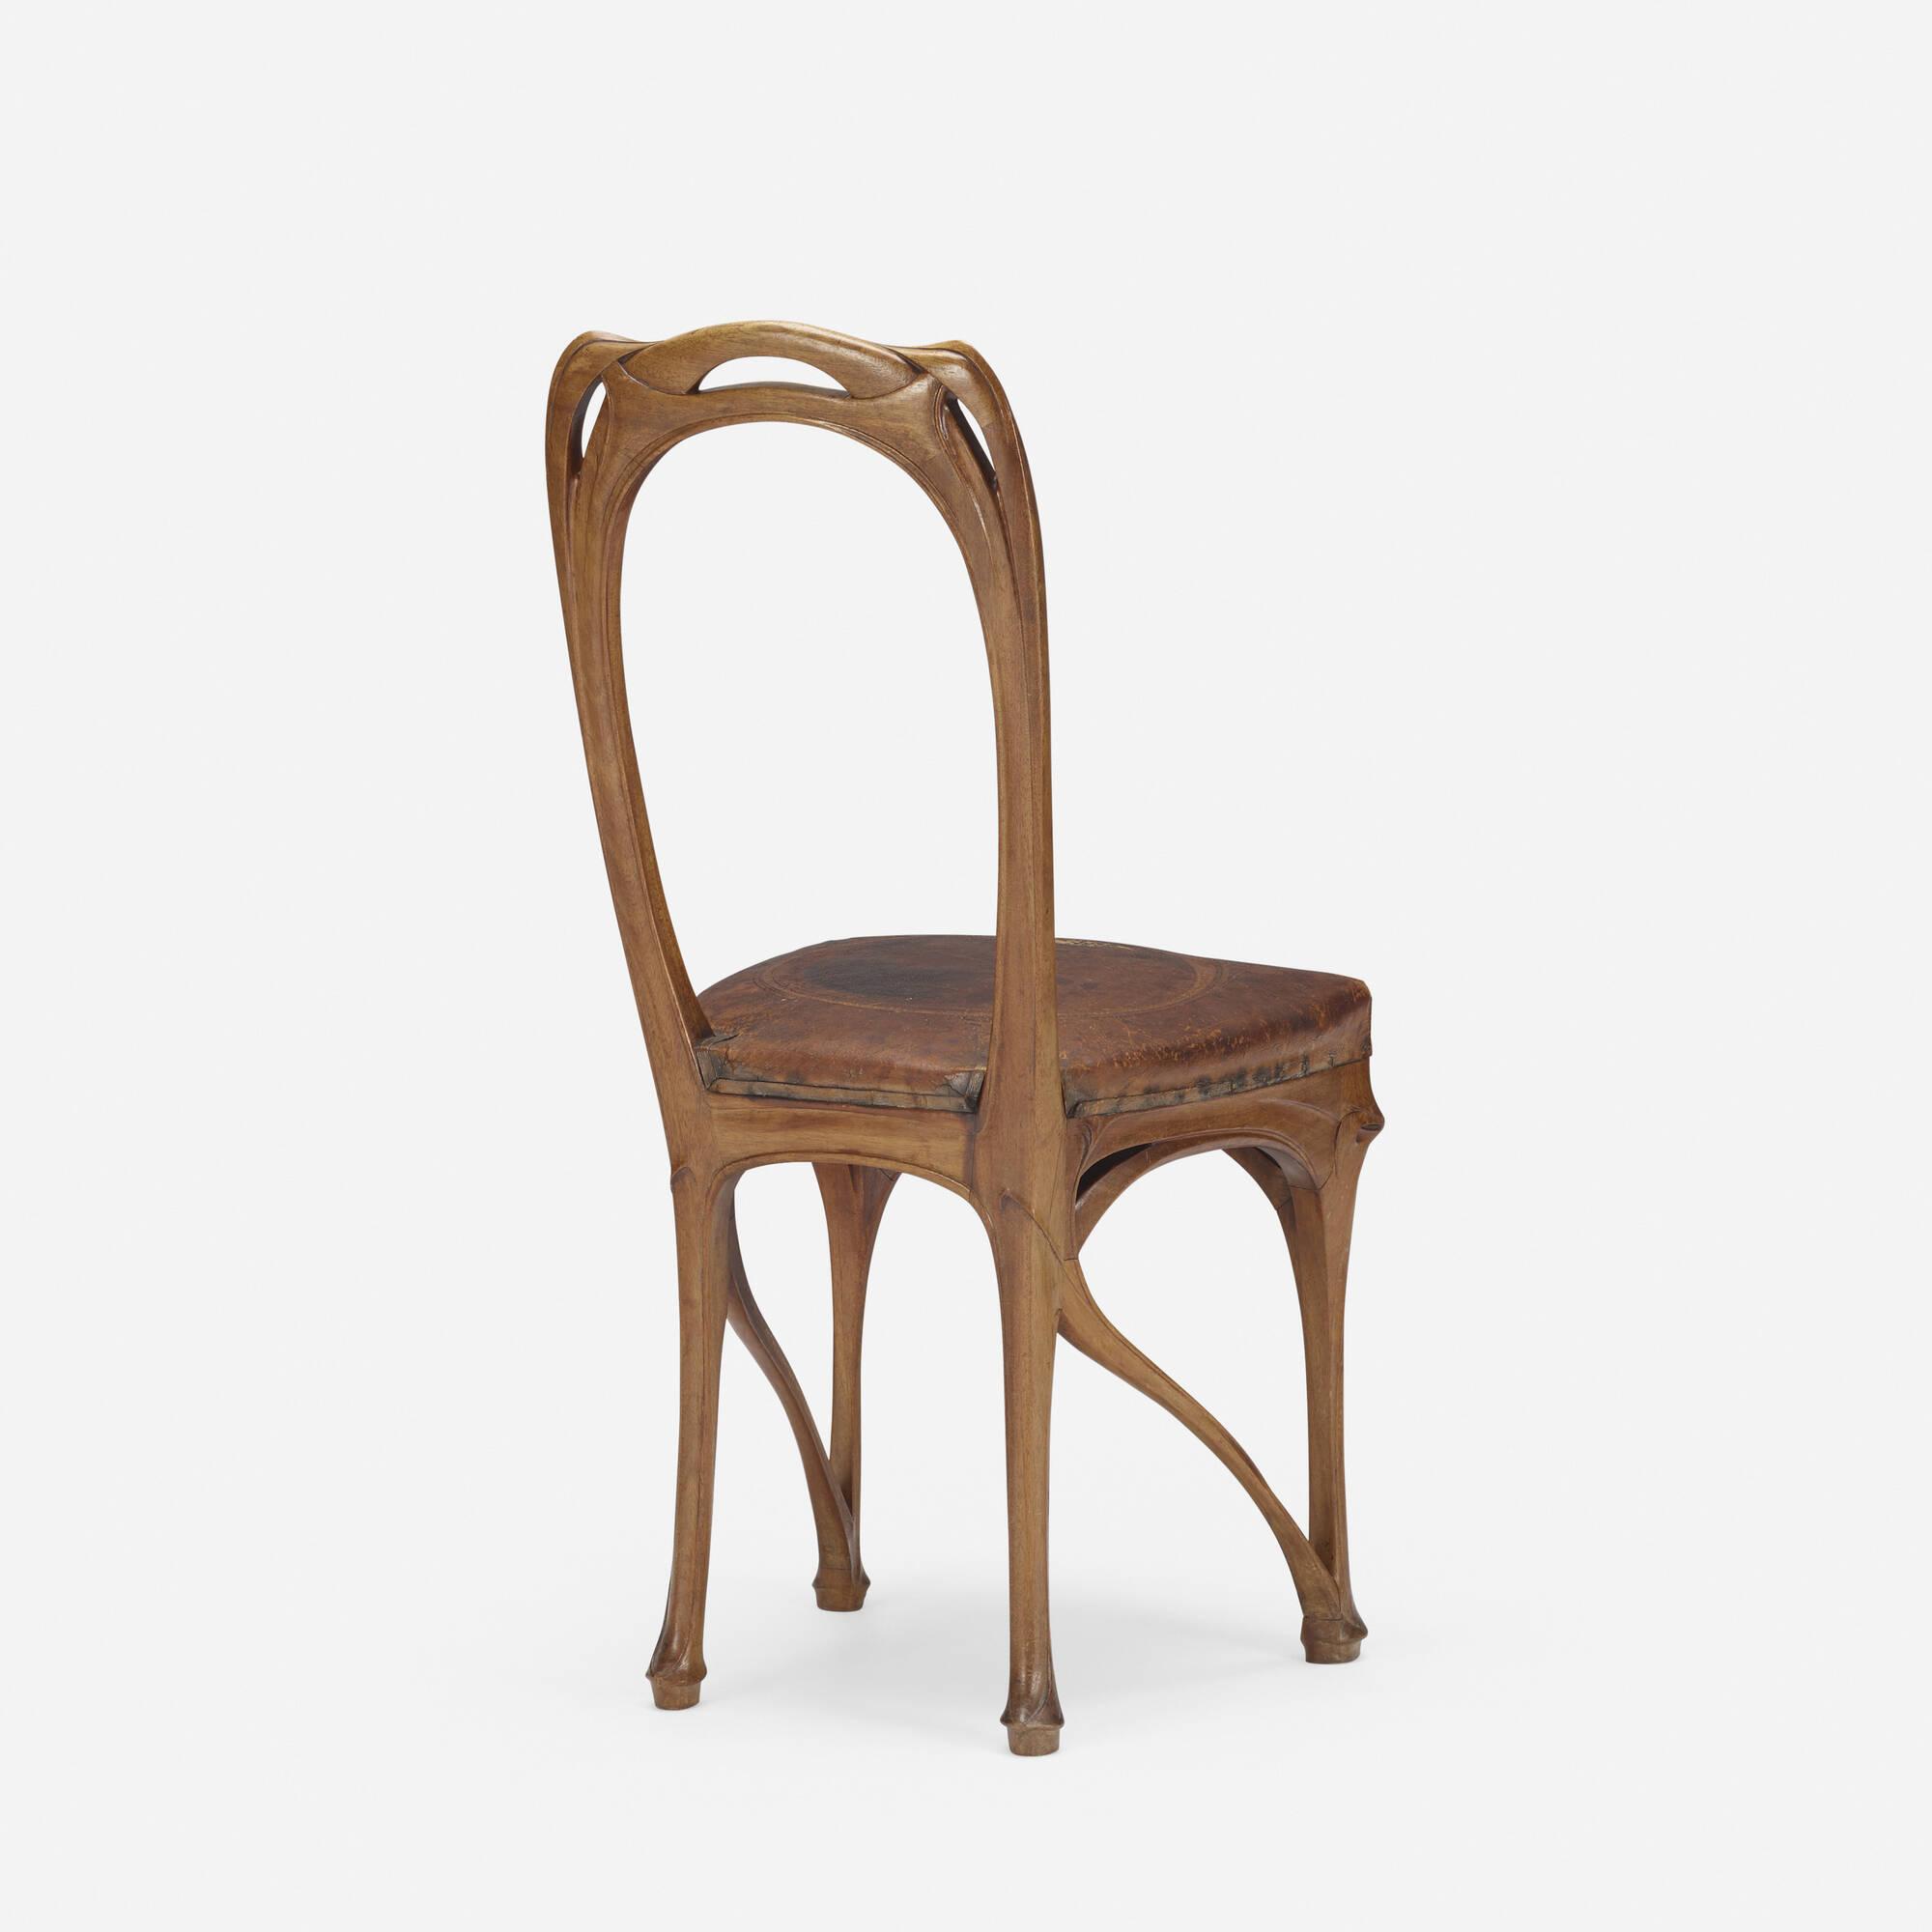 Hector guimard furniture best furniture 2017 for Chair design 2000